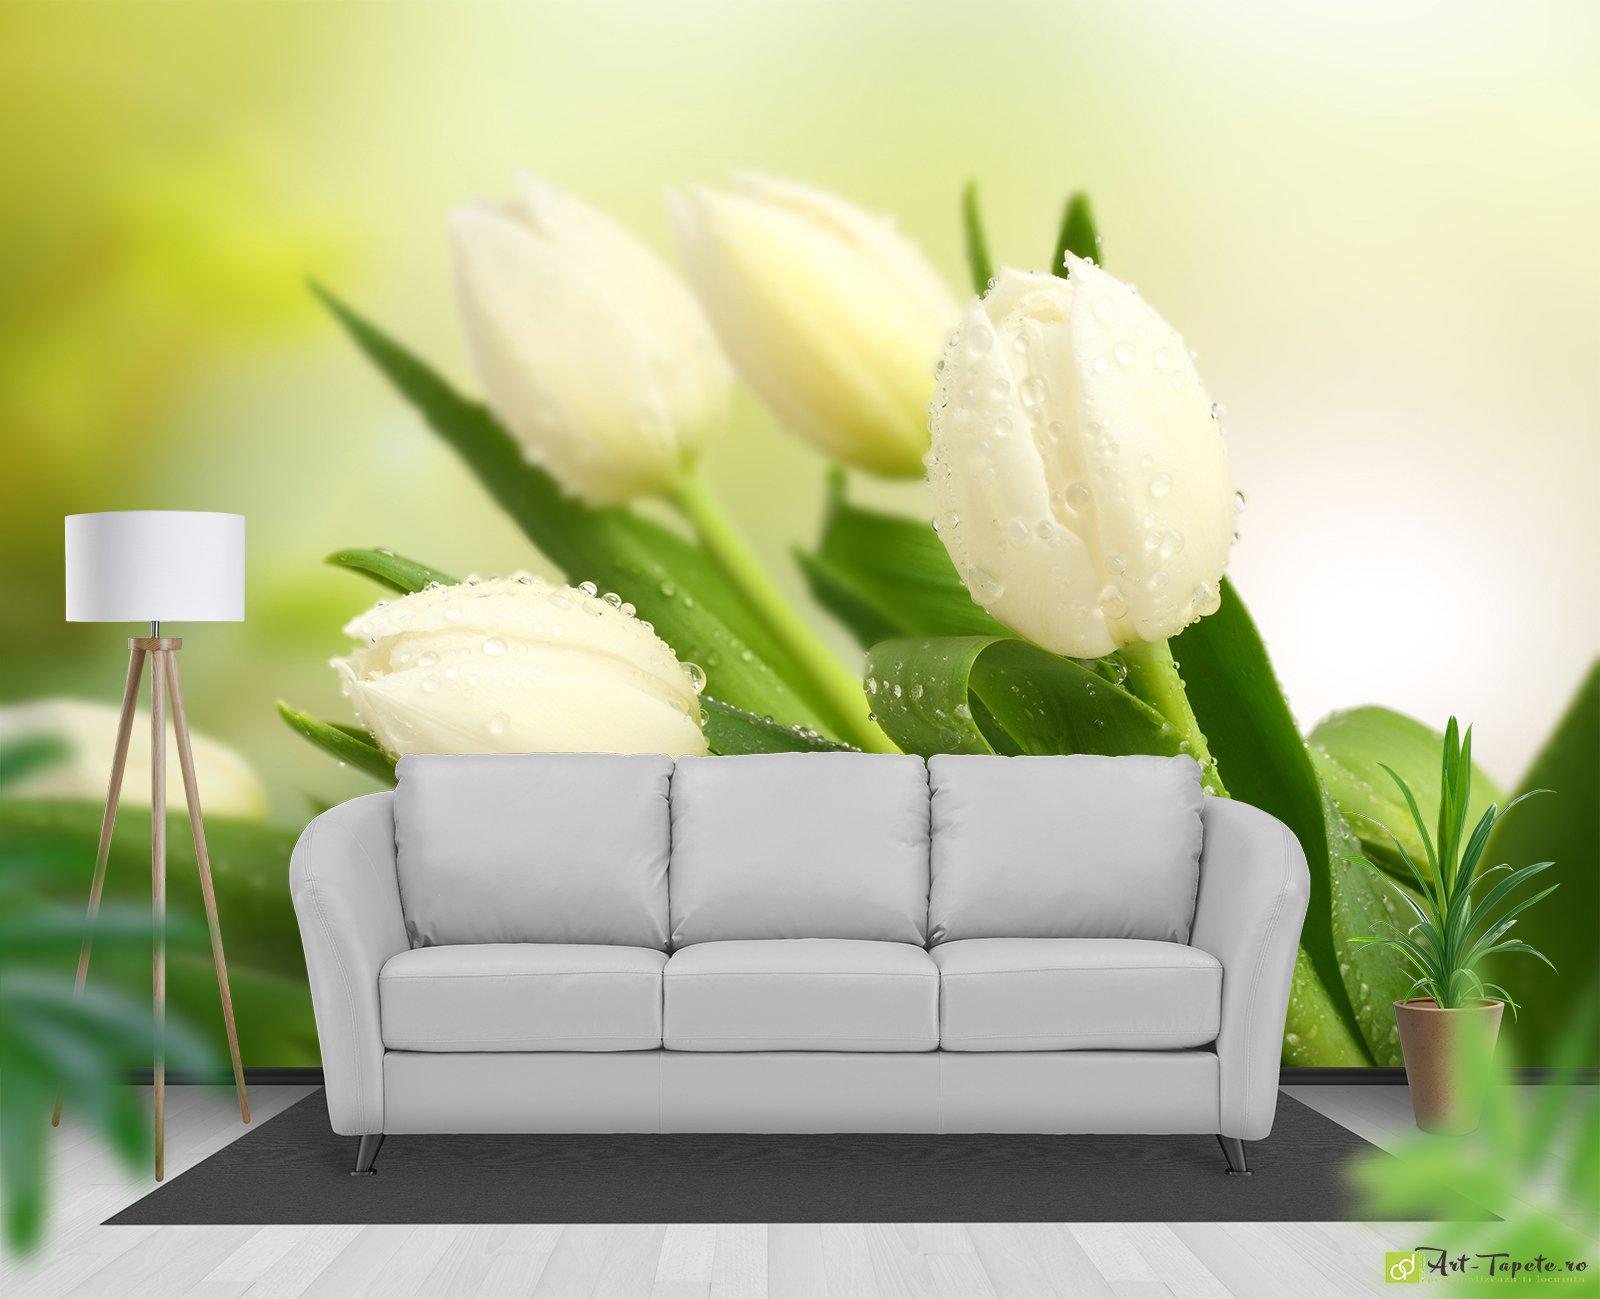 Обои тюльпаны на стены